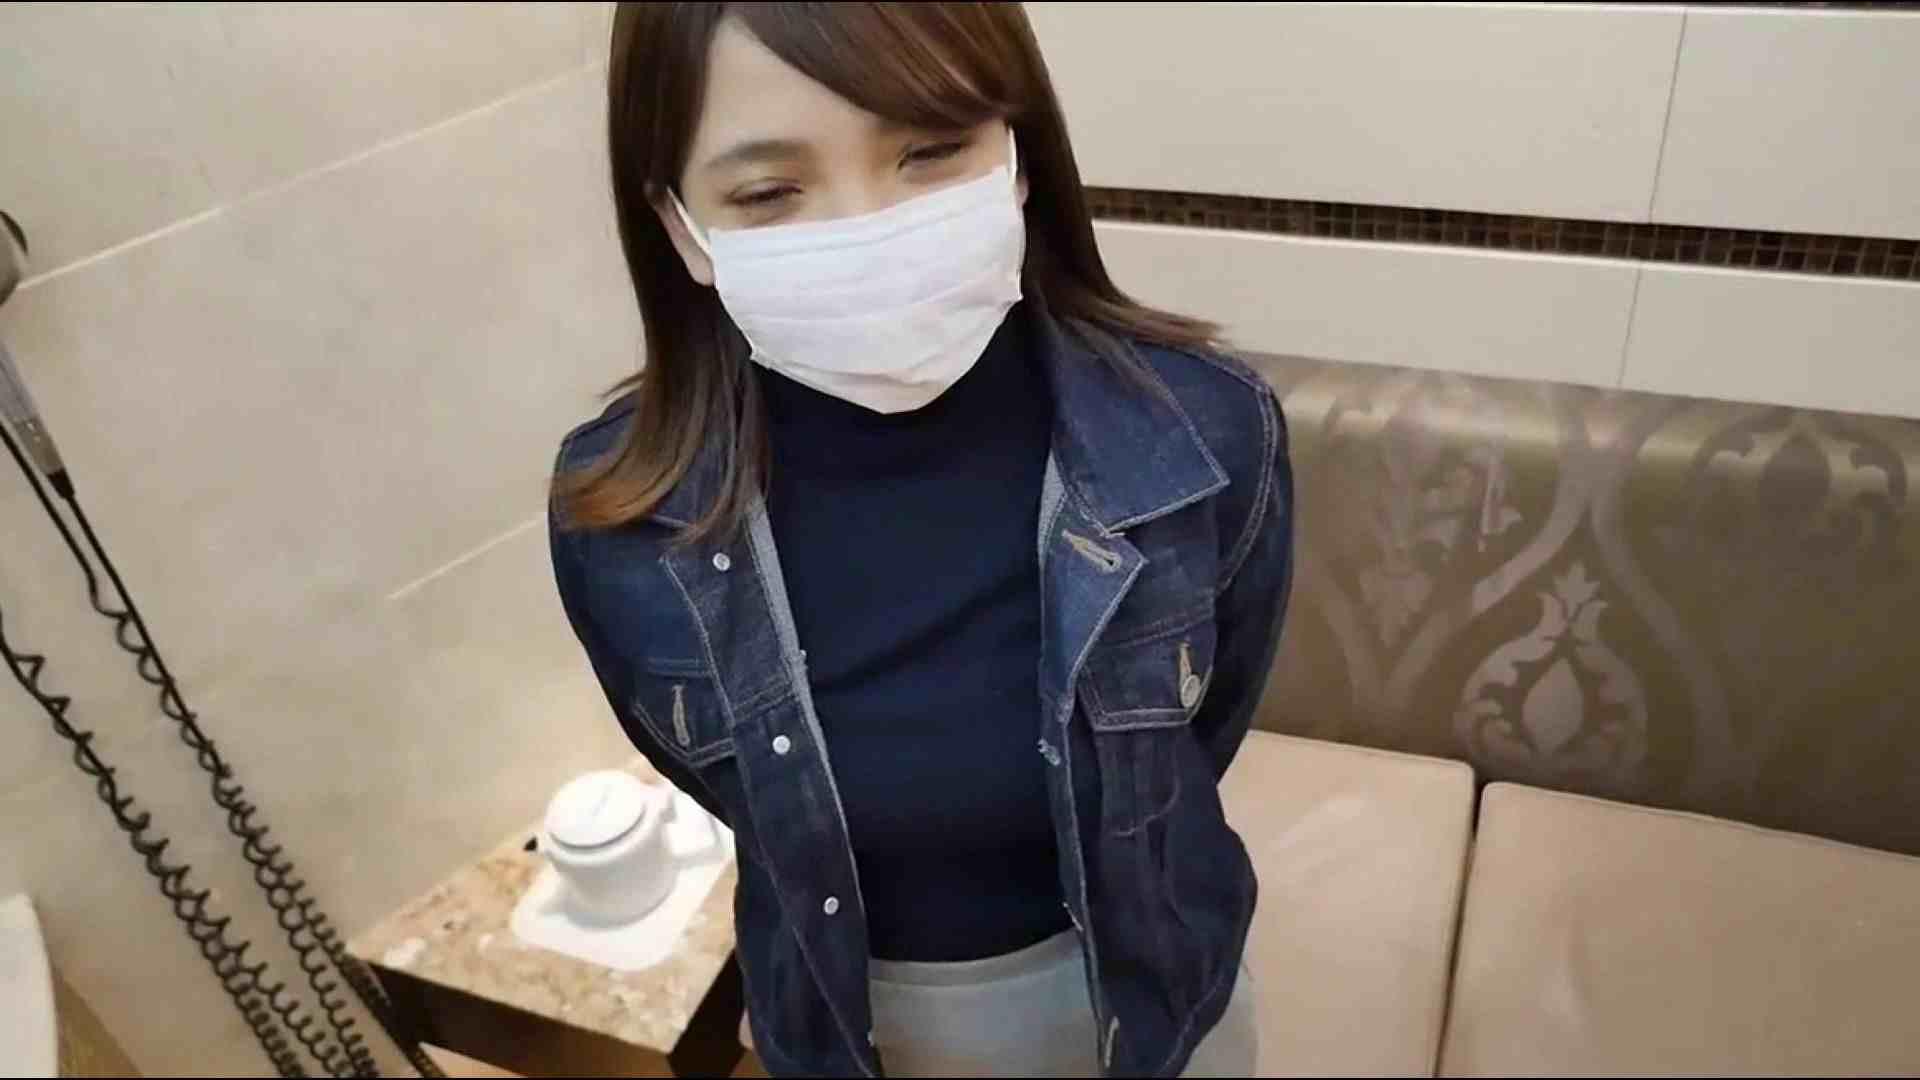 S級厳選美女ビッチガールVol.41 前編 美女  83pic 2